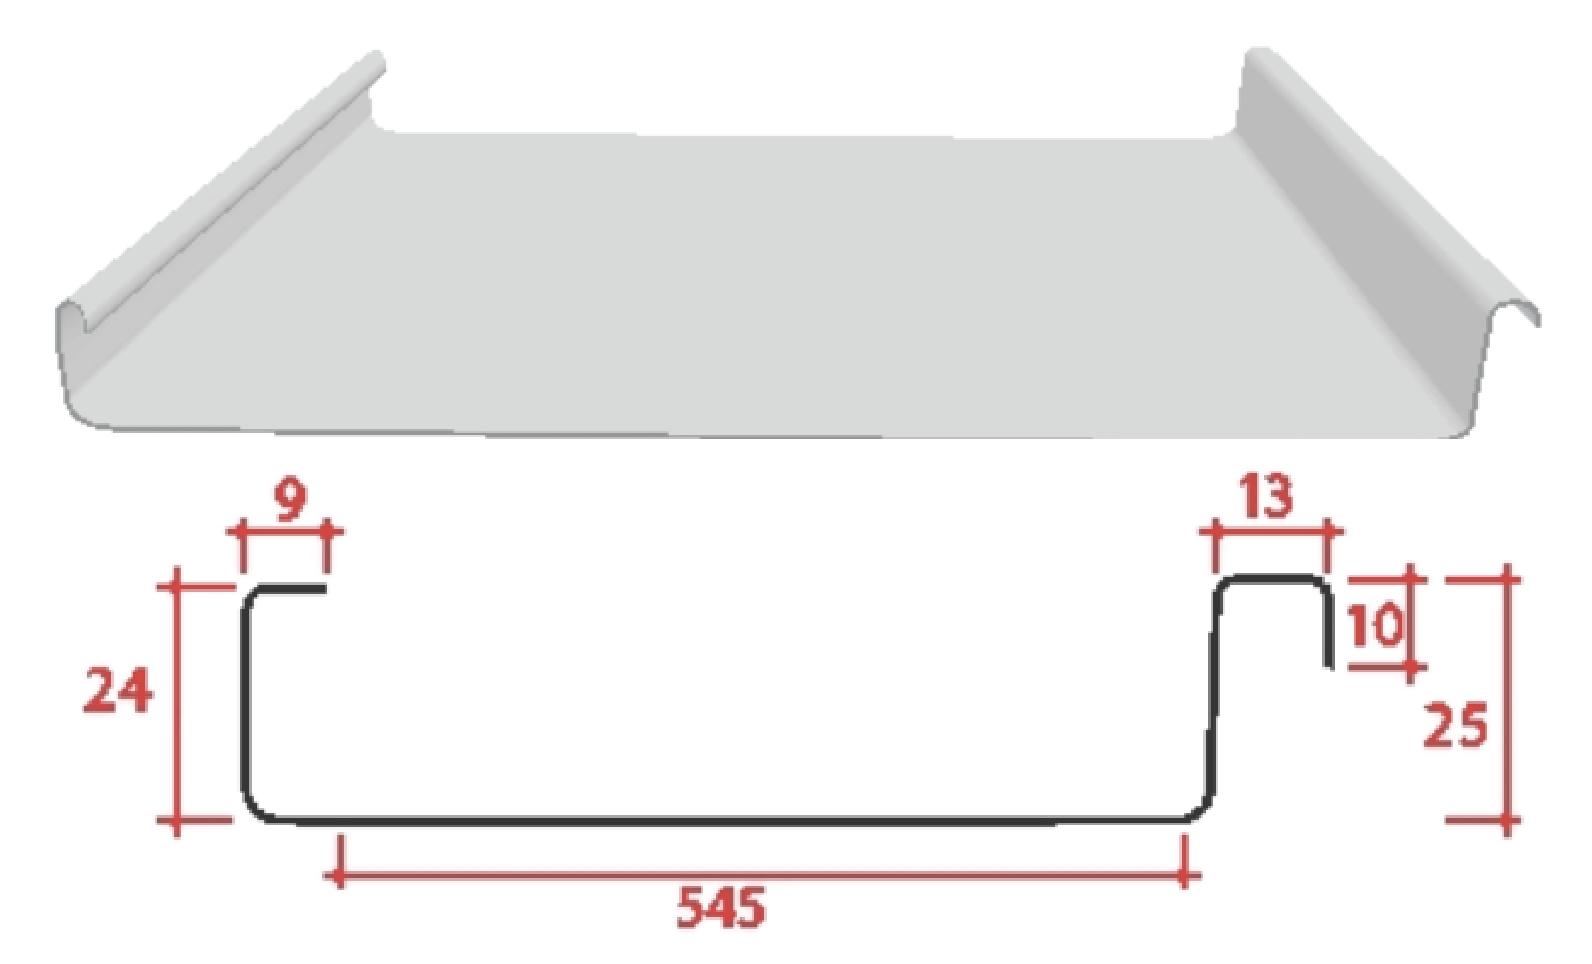 jumta segumi bilde 4 valcprofils